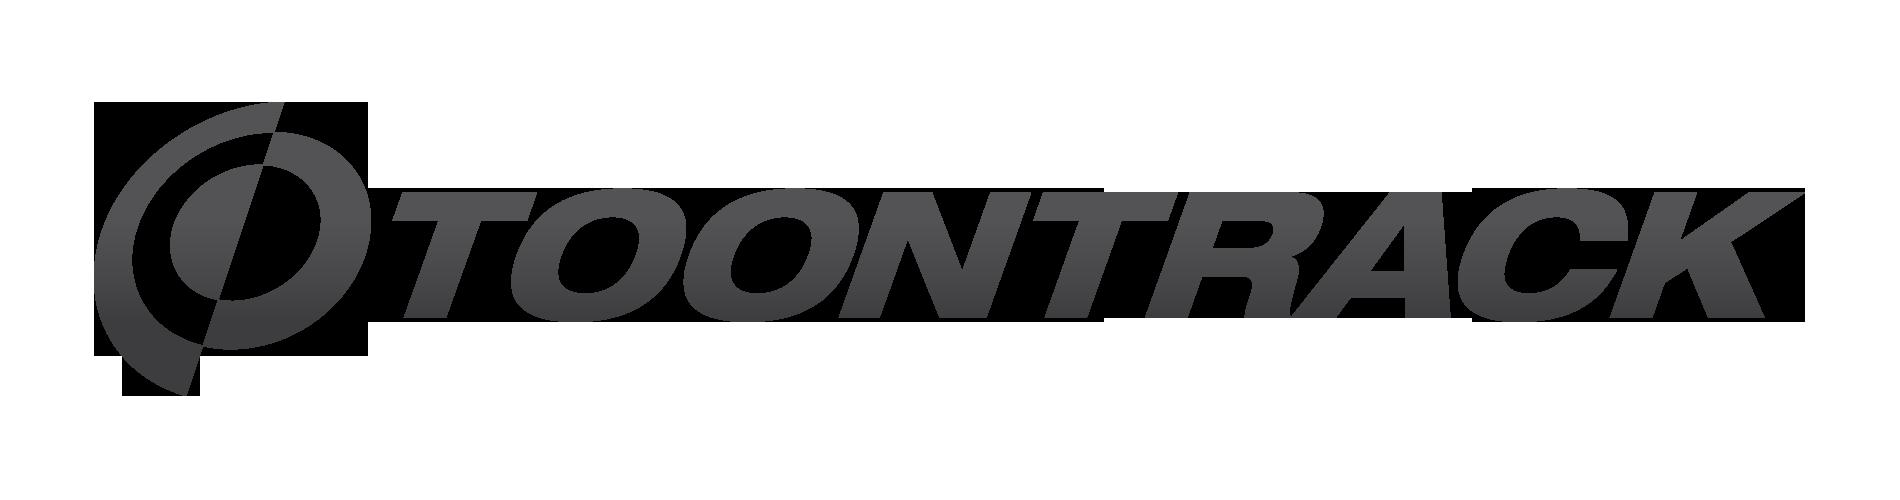 Toontrack logo black